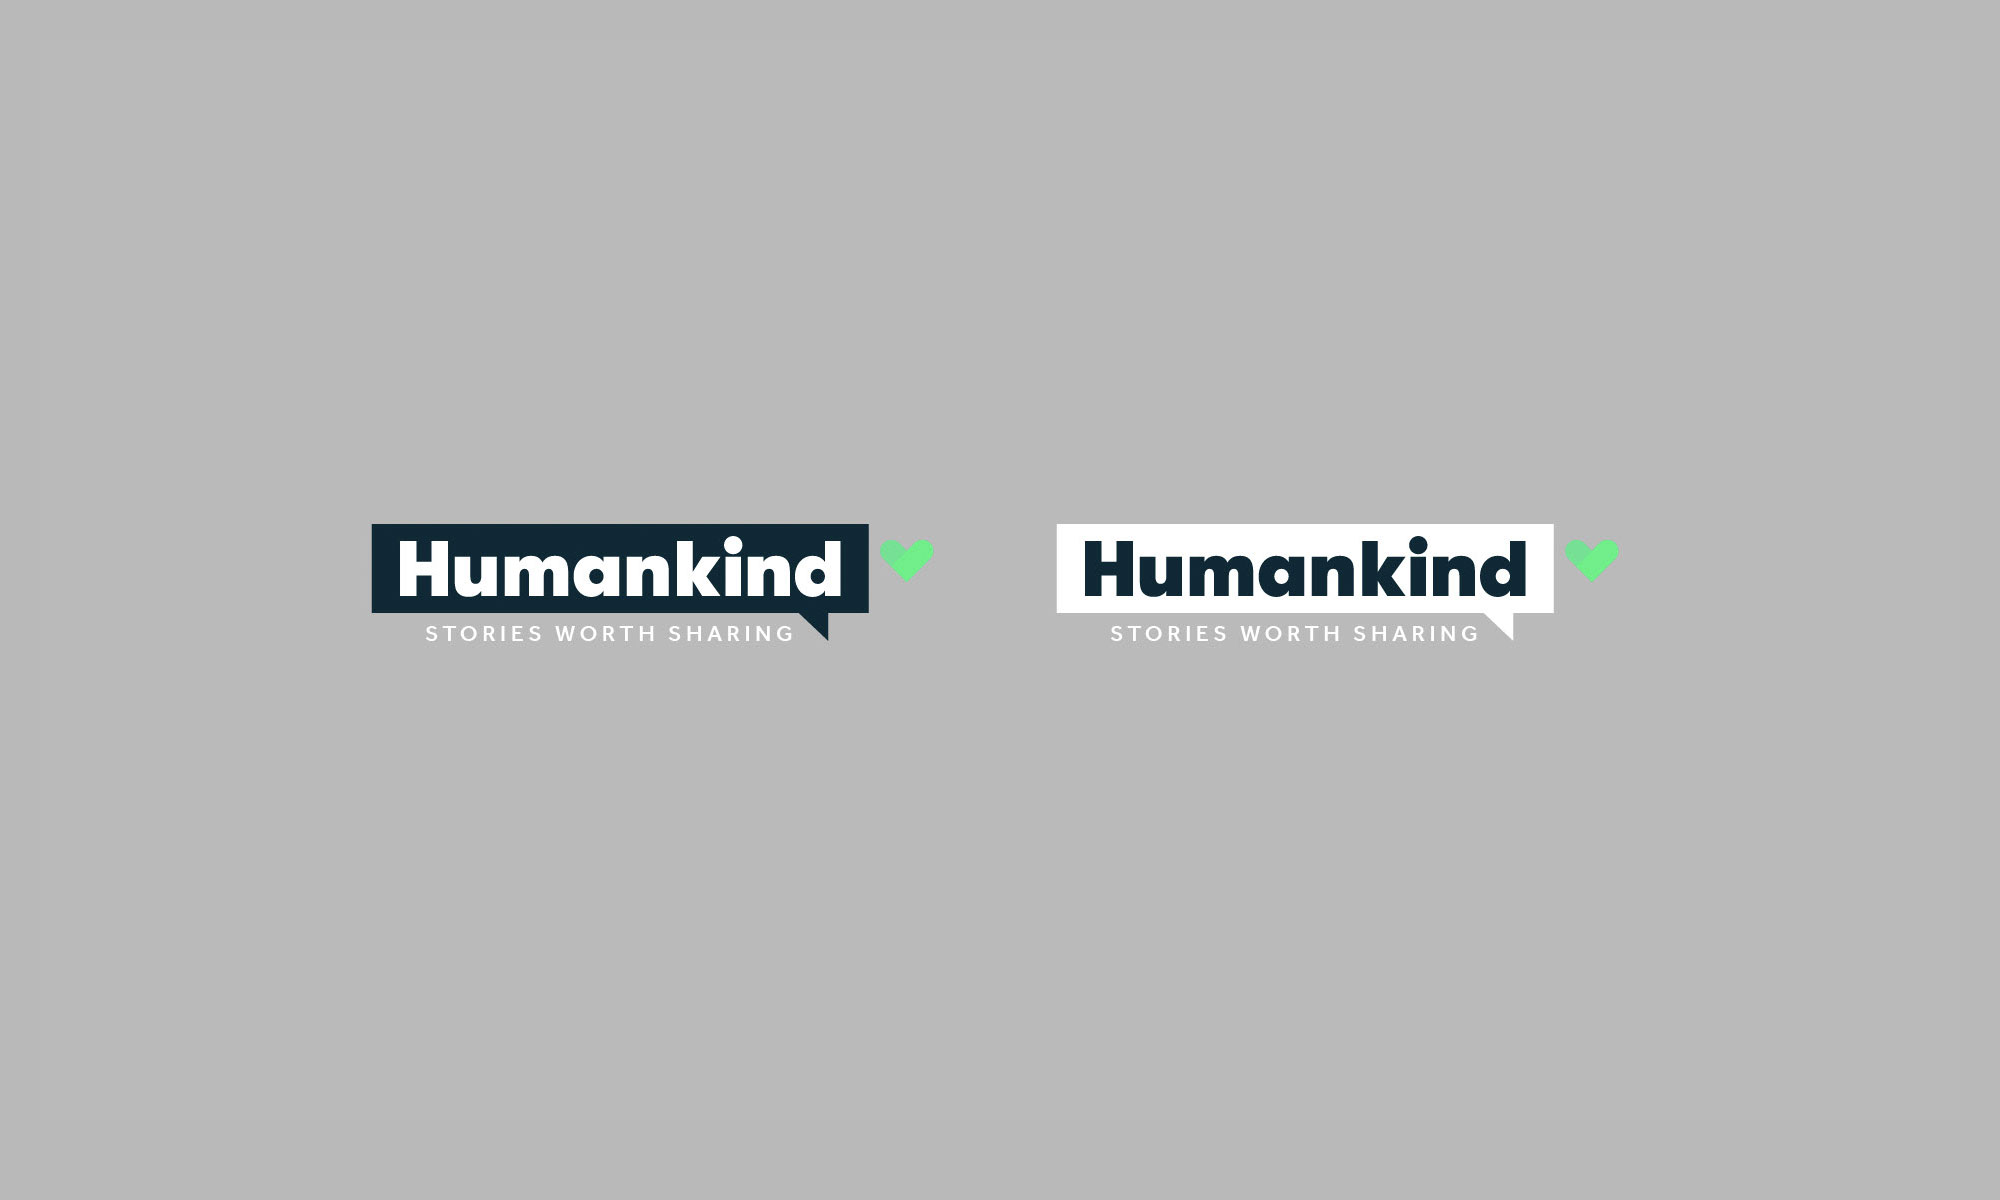 humankind logos